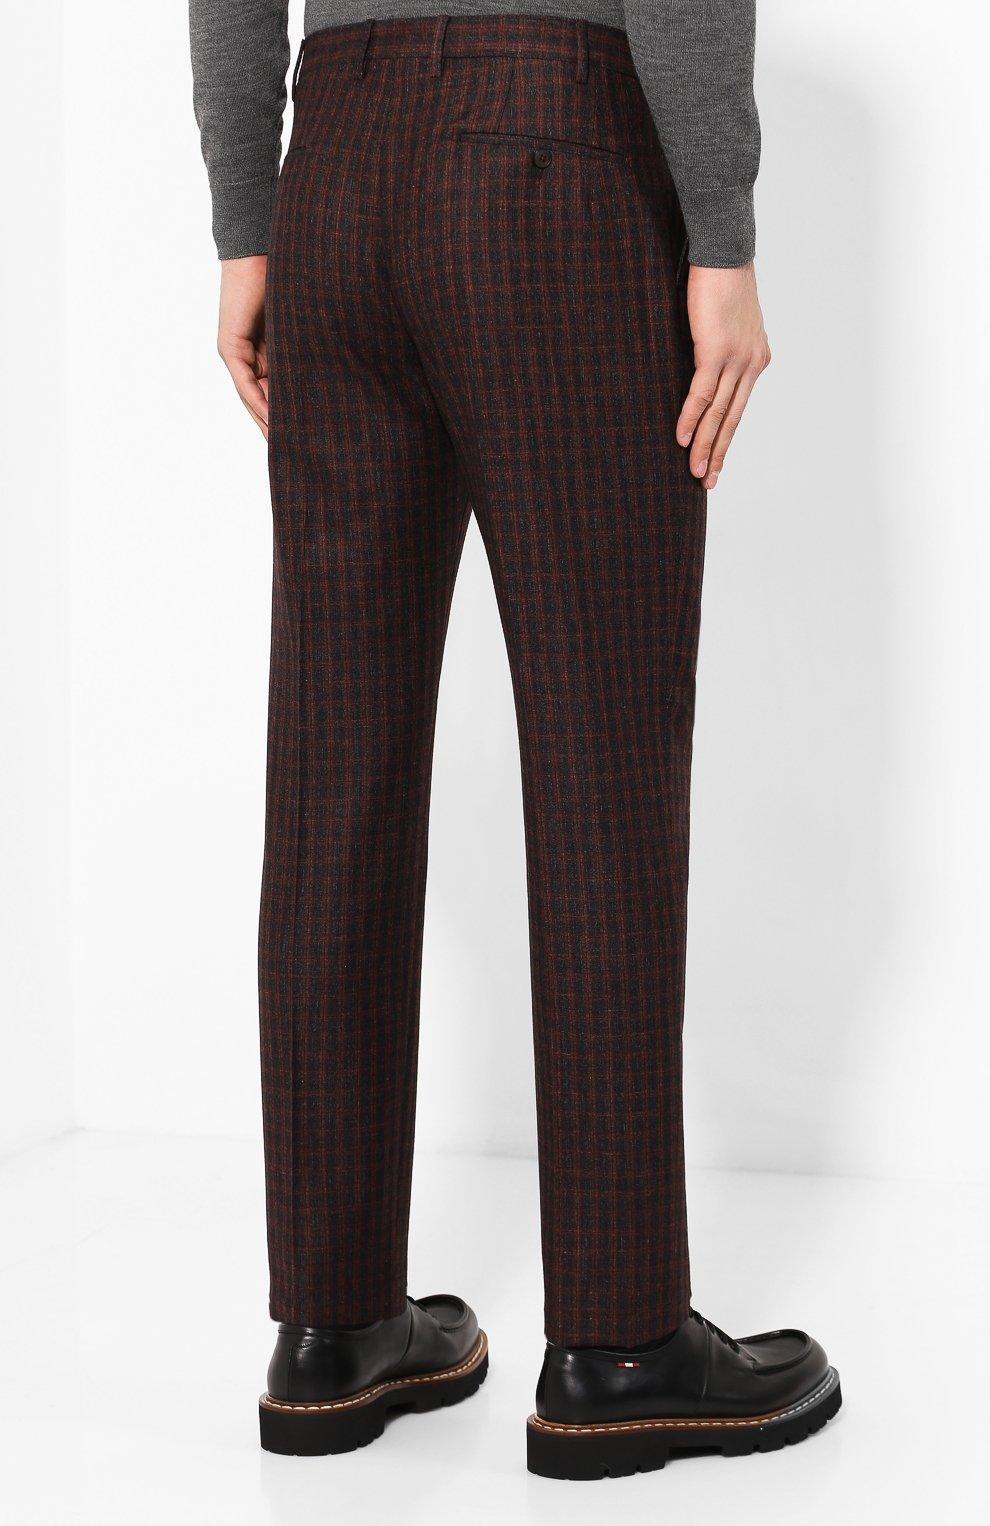 Мужские брюки из смеси шерсти и шелка ANDREA CAMPAGNA коричневого цвета, арт. VULCAN0/VB1293 | Фото 4